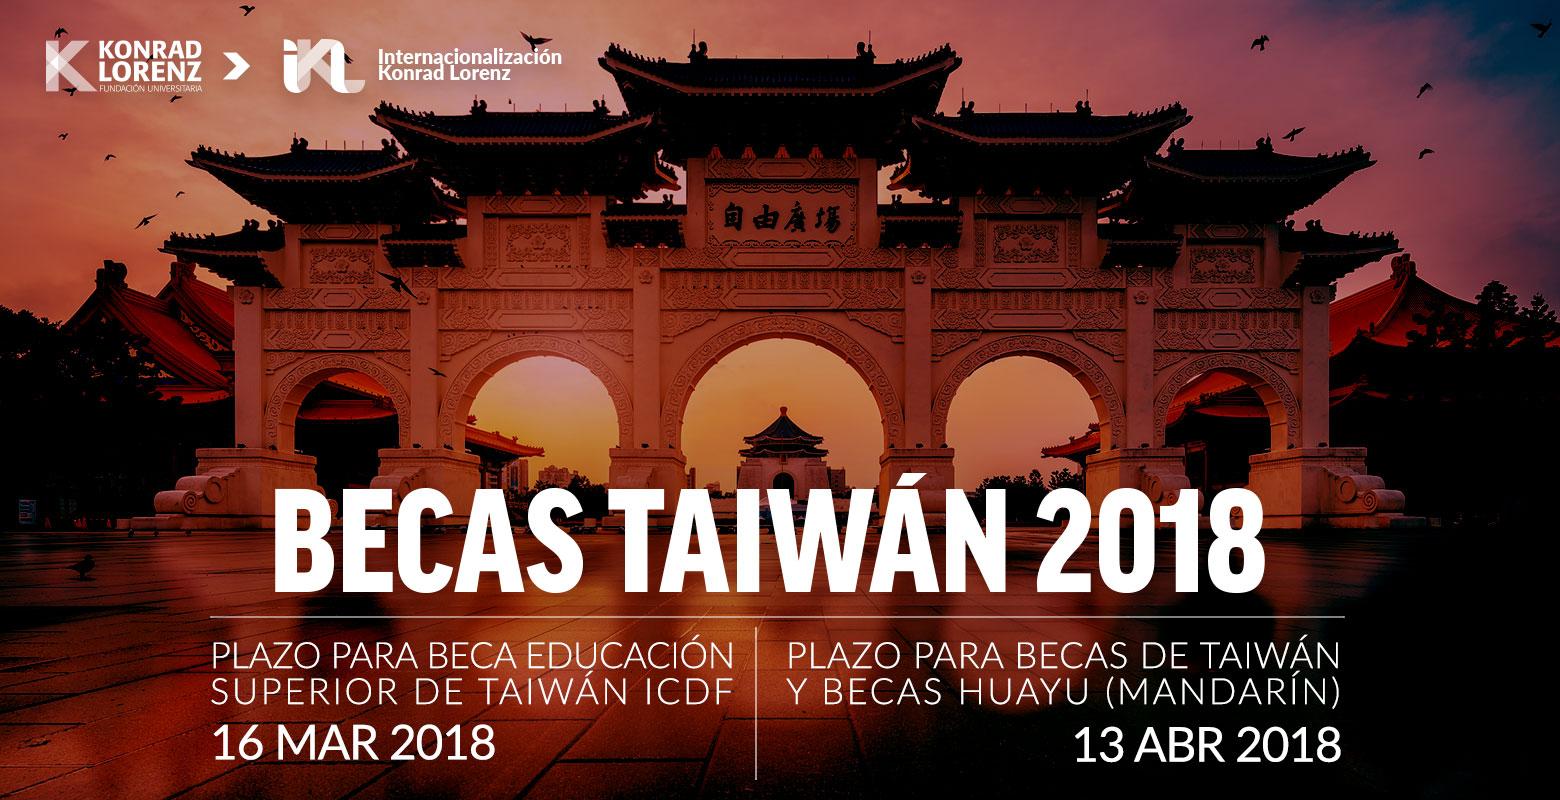 Programa de Becas Taiwán 2018